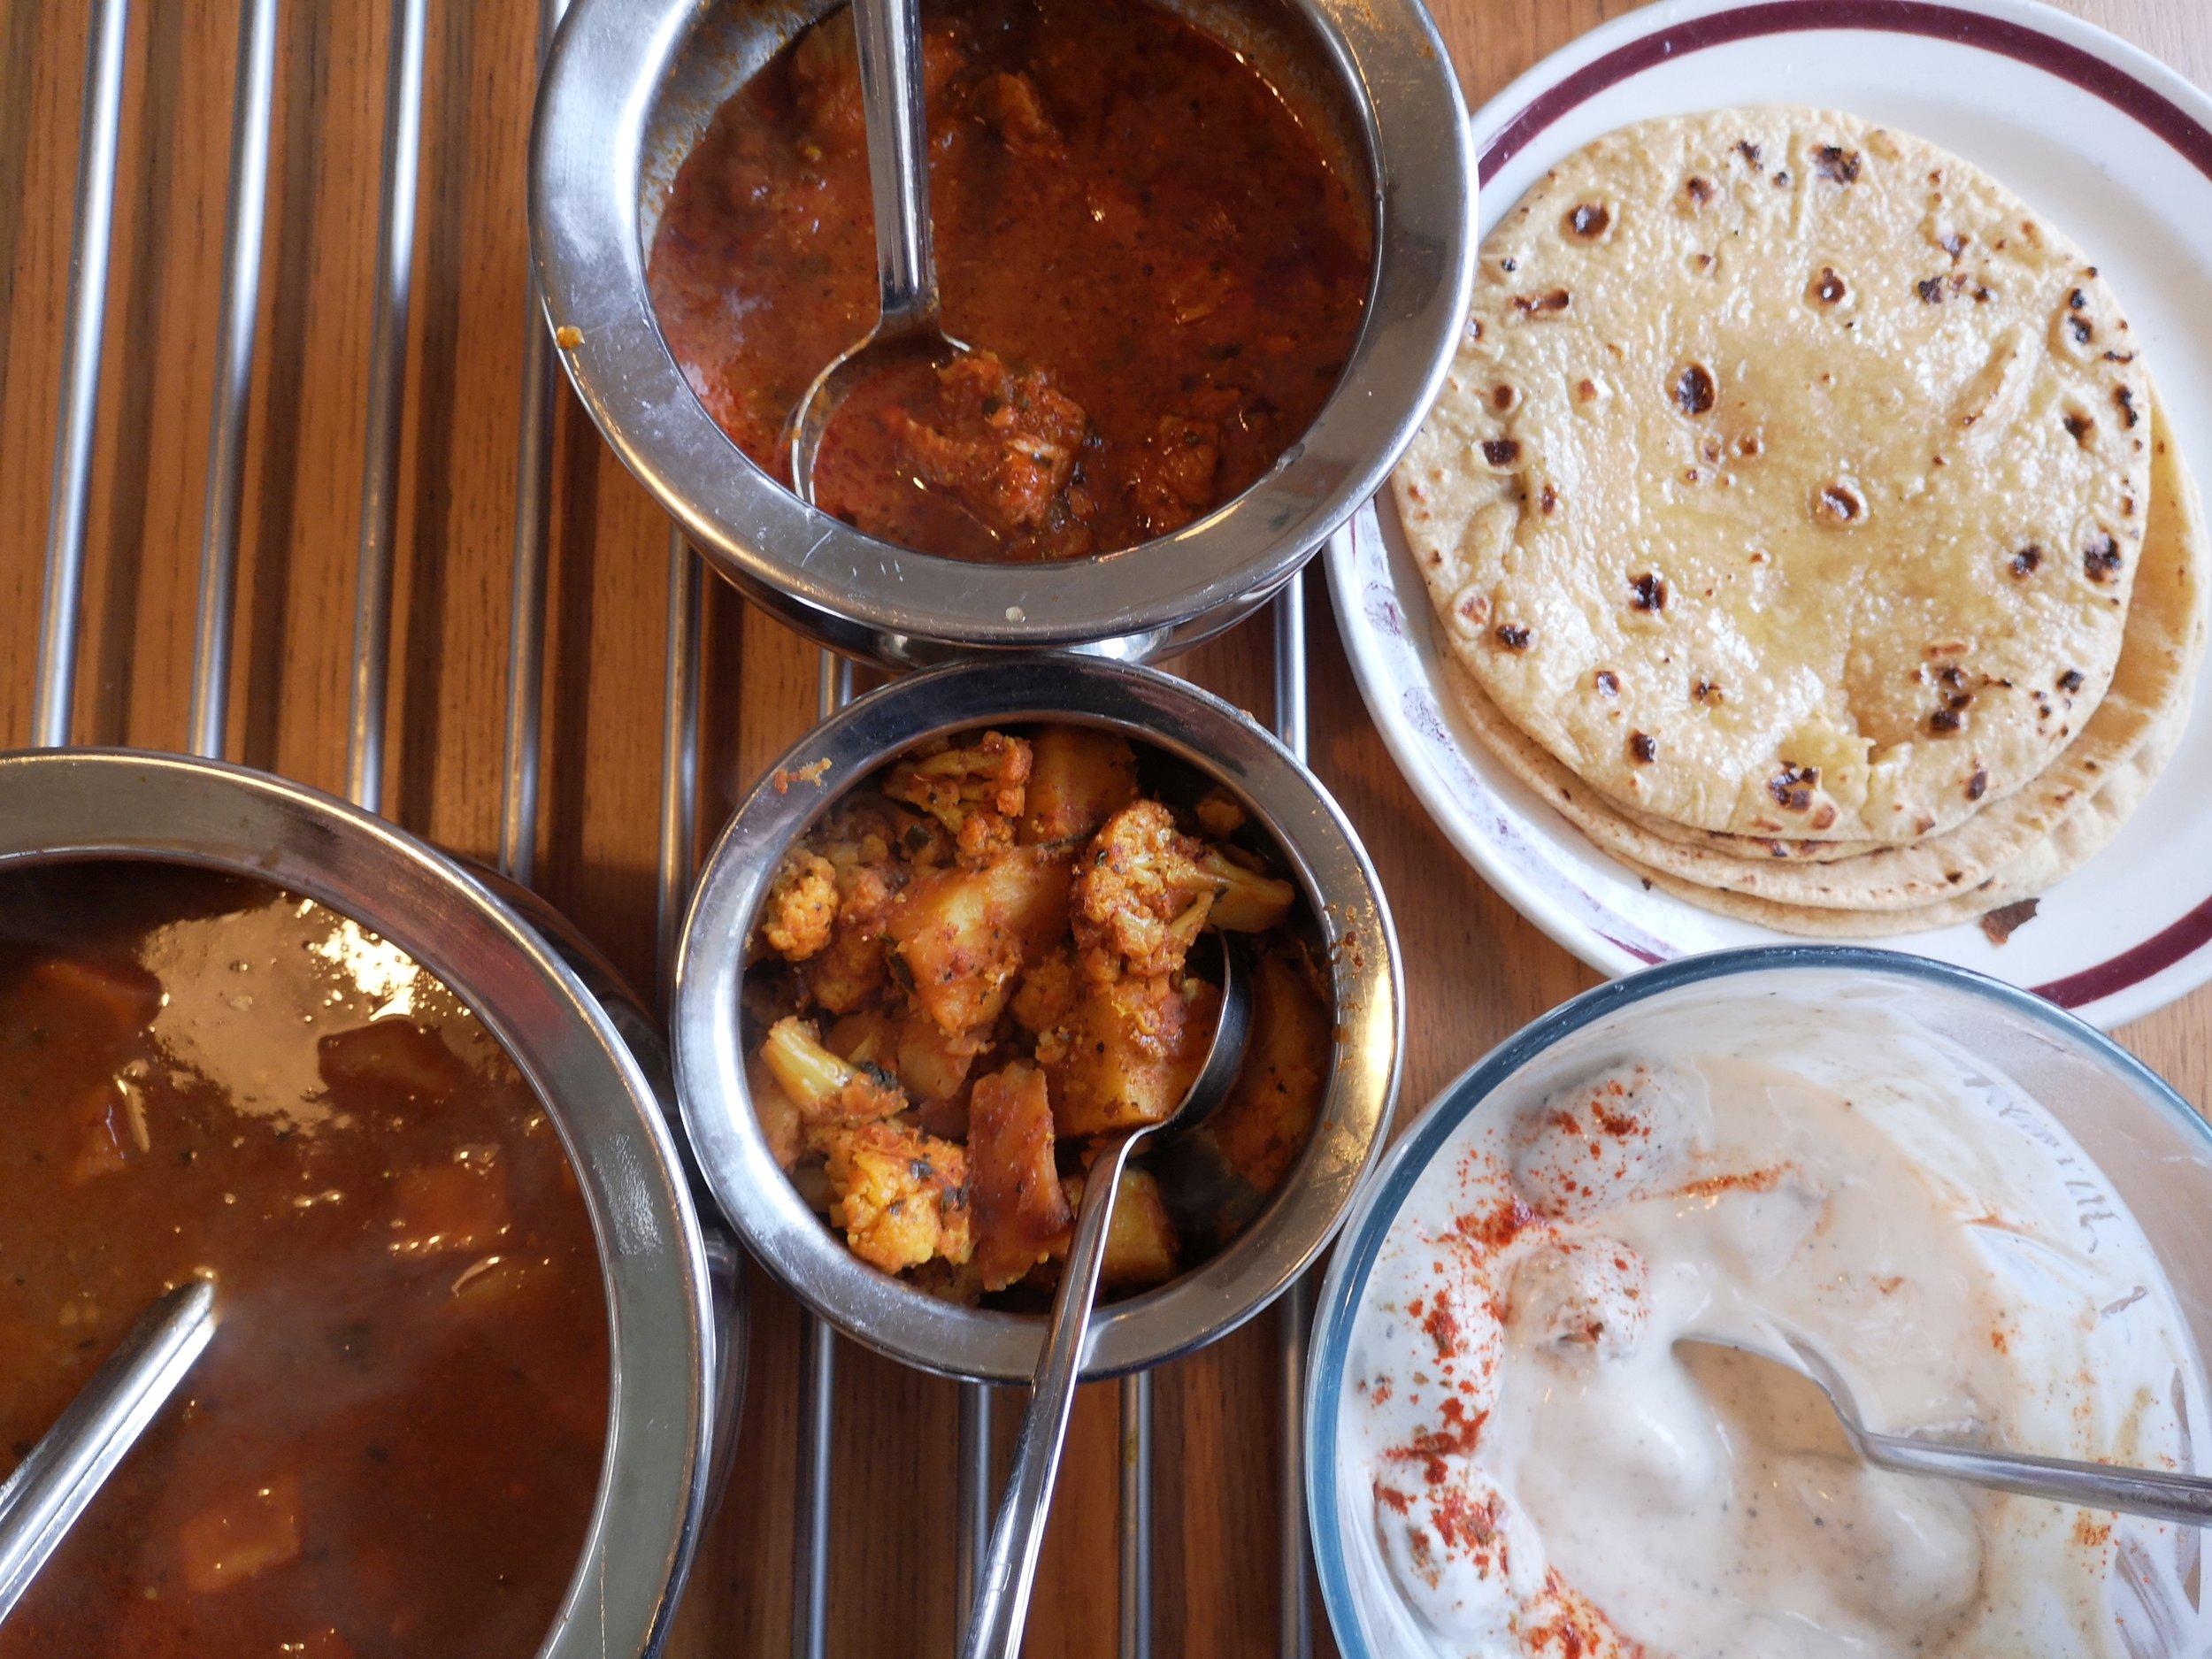 Yogurt, known as raita, is a popular Punjabi staple.